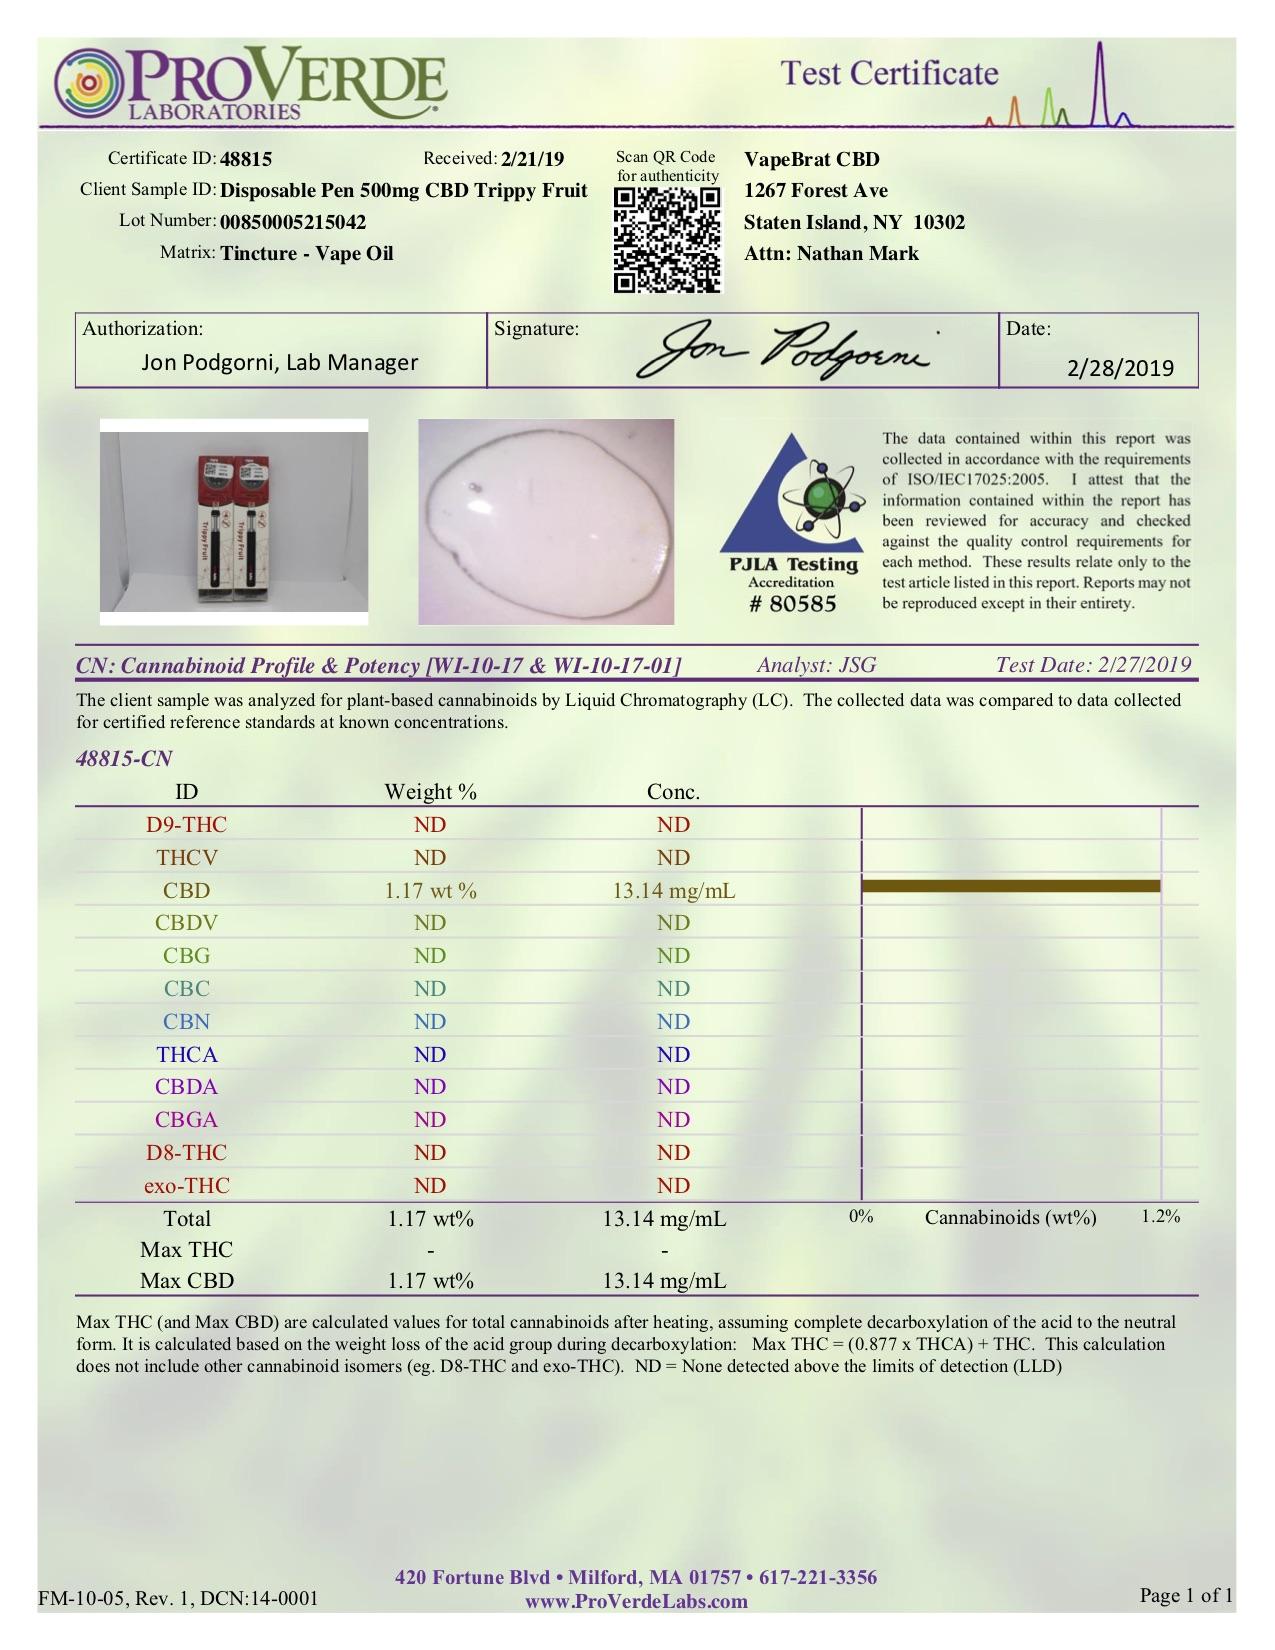 48815-cn-disposable-pen-500mg-cbd-trippy-fruit.jpg